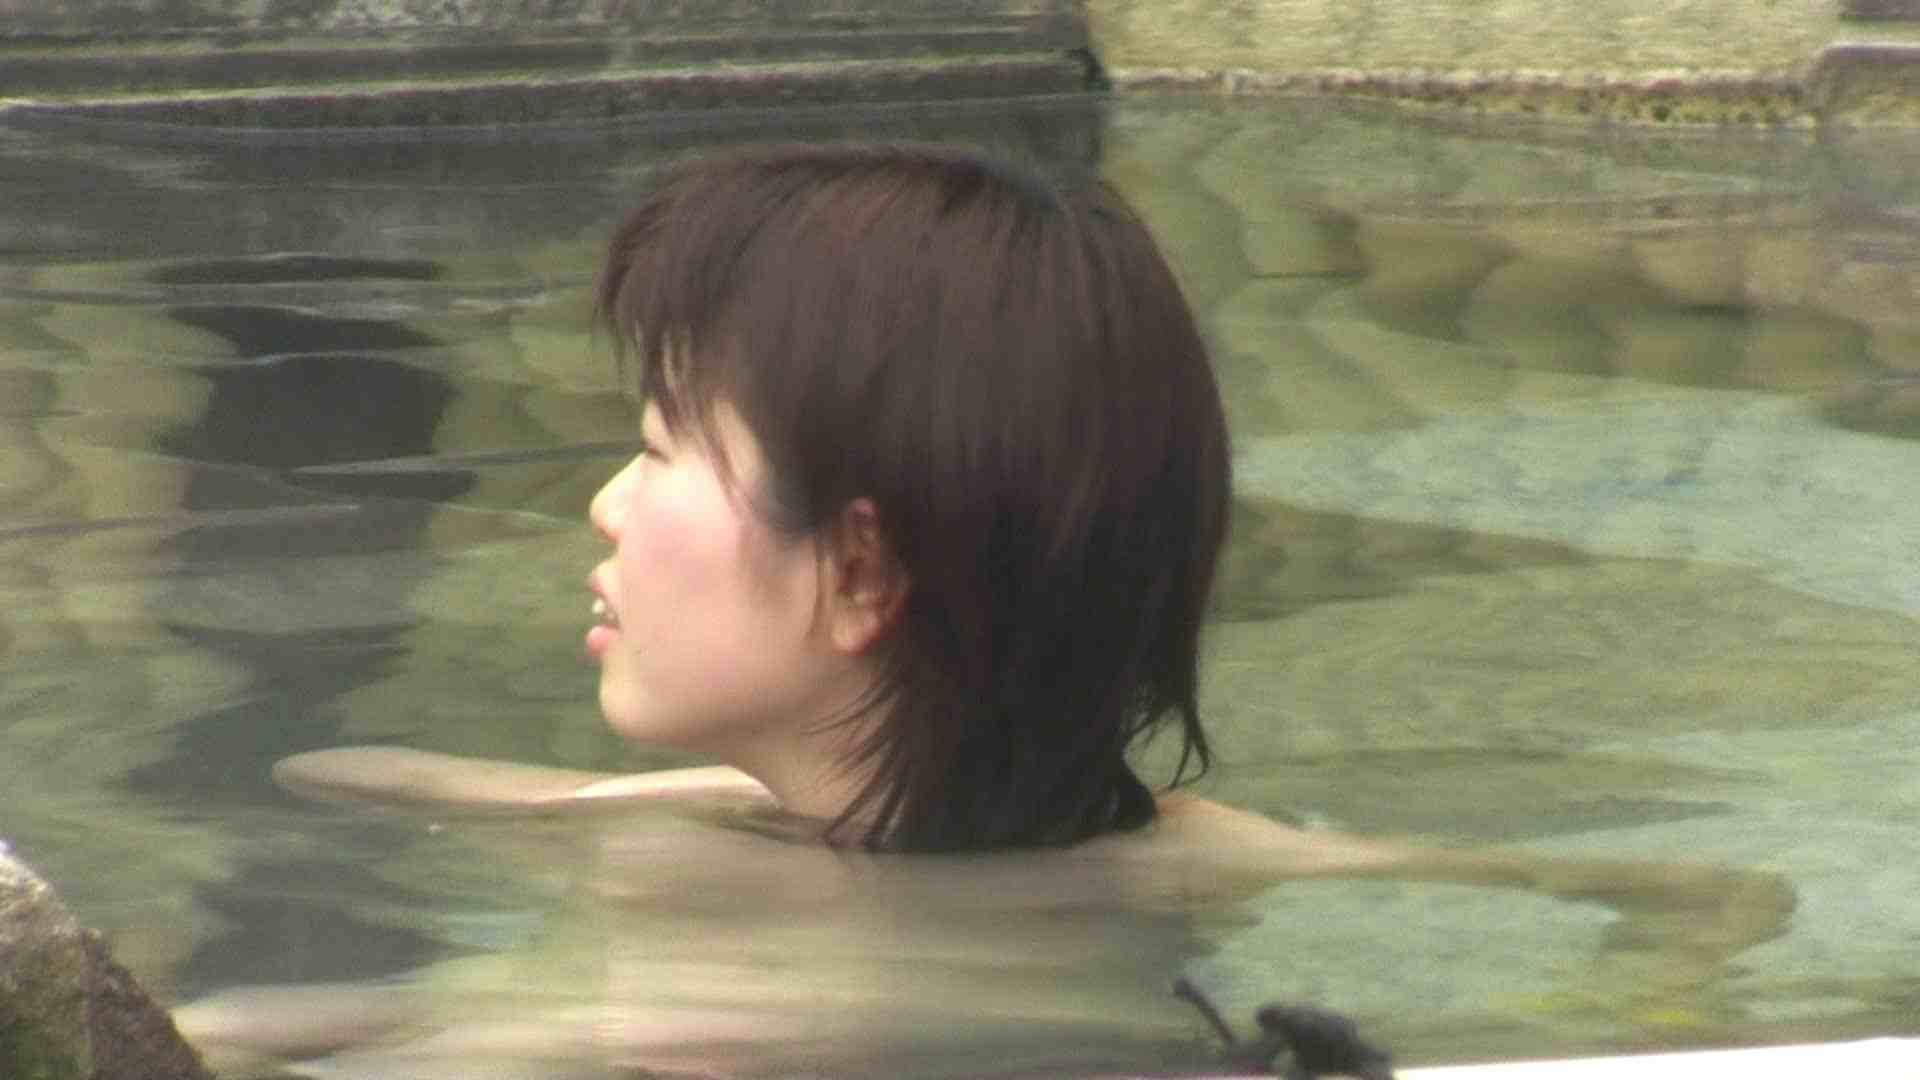 Aquaな露天風呂Vol.675 露天風呂編 | 盗撮シリーズ  91PIX 23